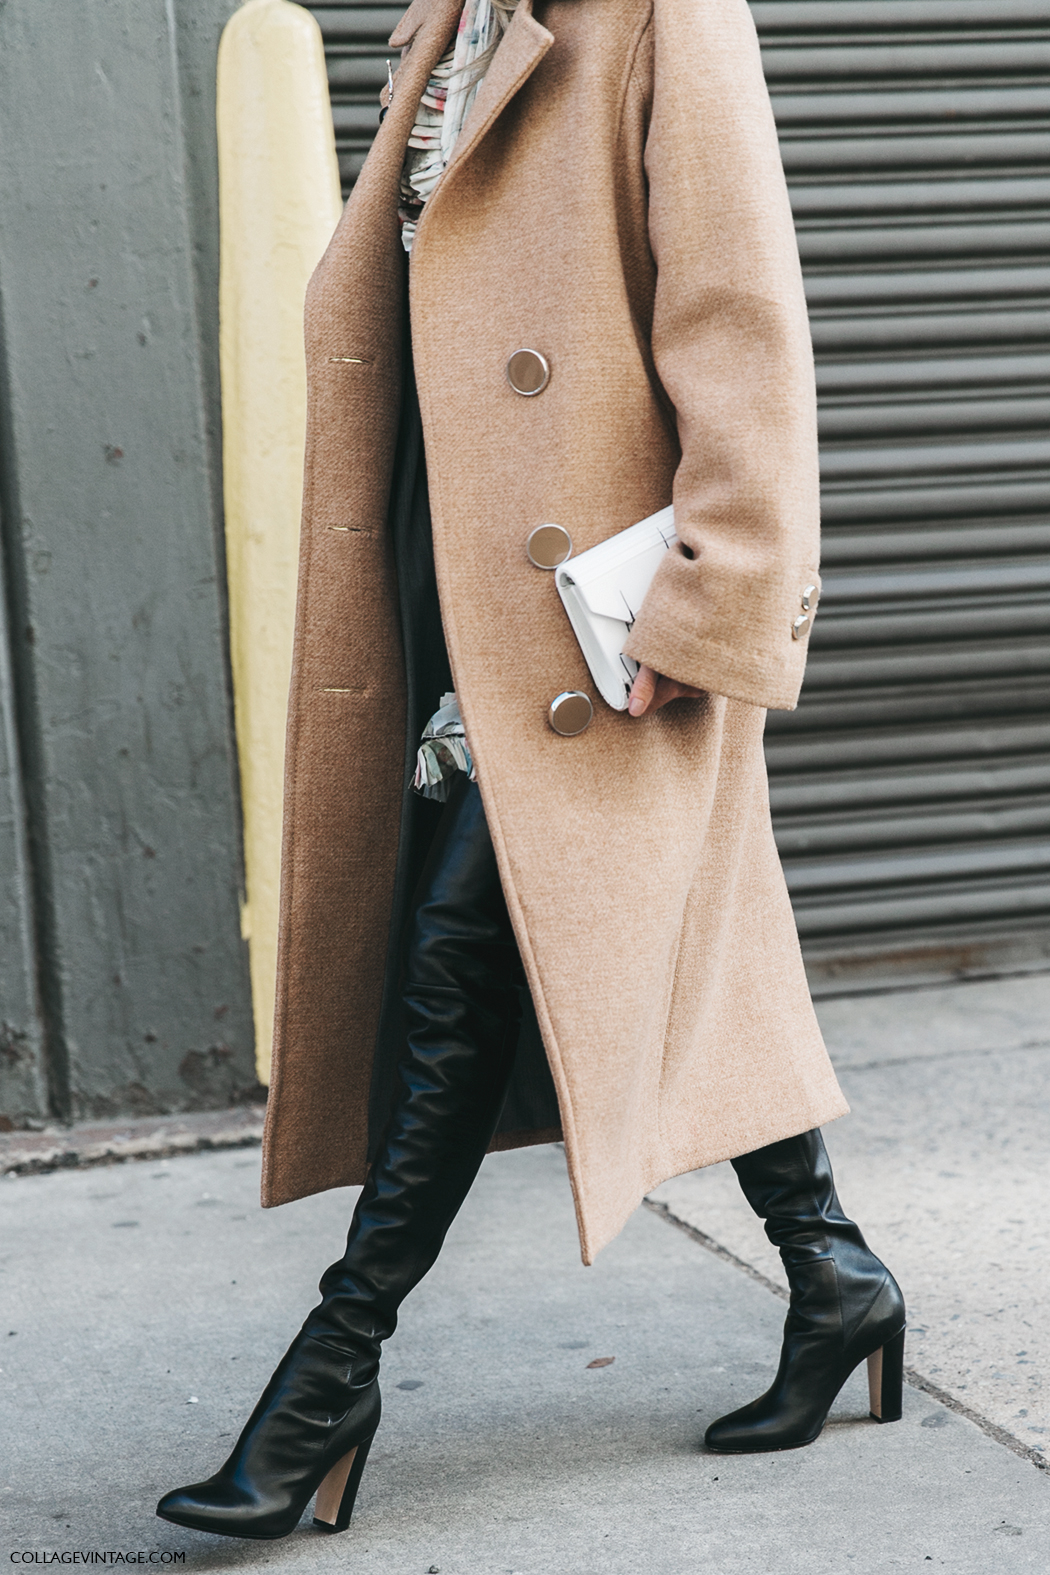 NYFW-New_York_Fashion_Week-Fall_Winter-17-Street_Style-Helena_Bordon-Camel_Coat-XXL_Boots-Over_The_Knee-1